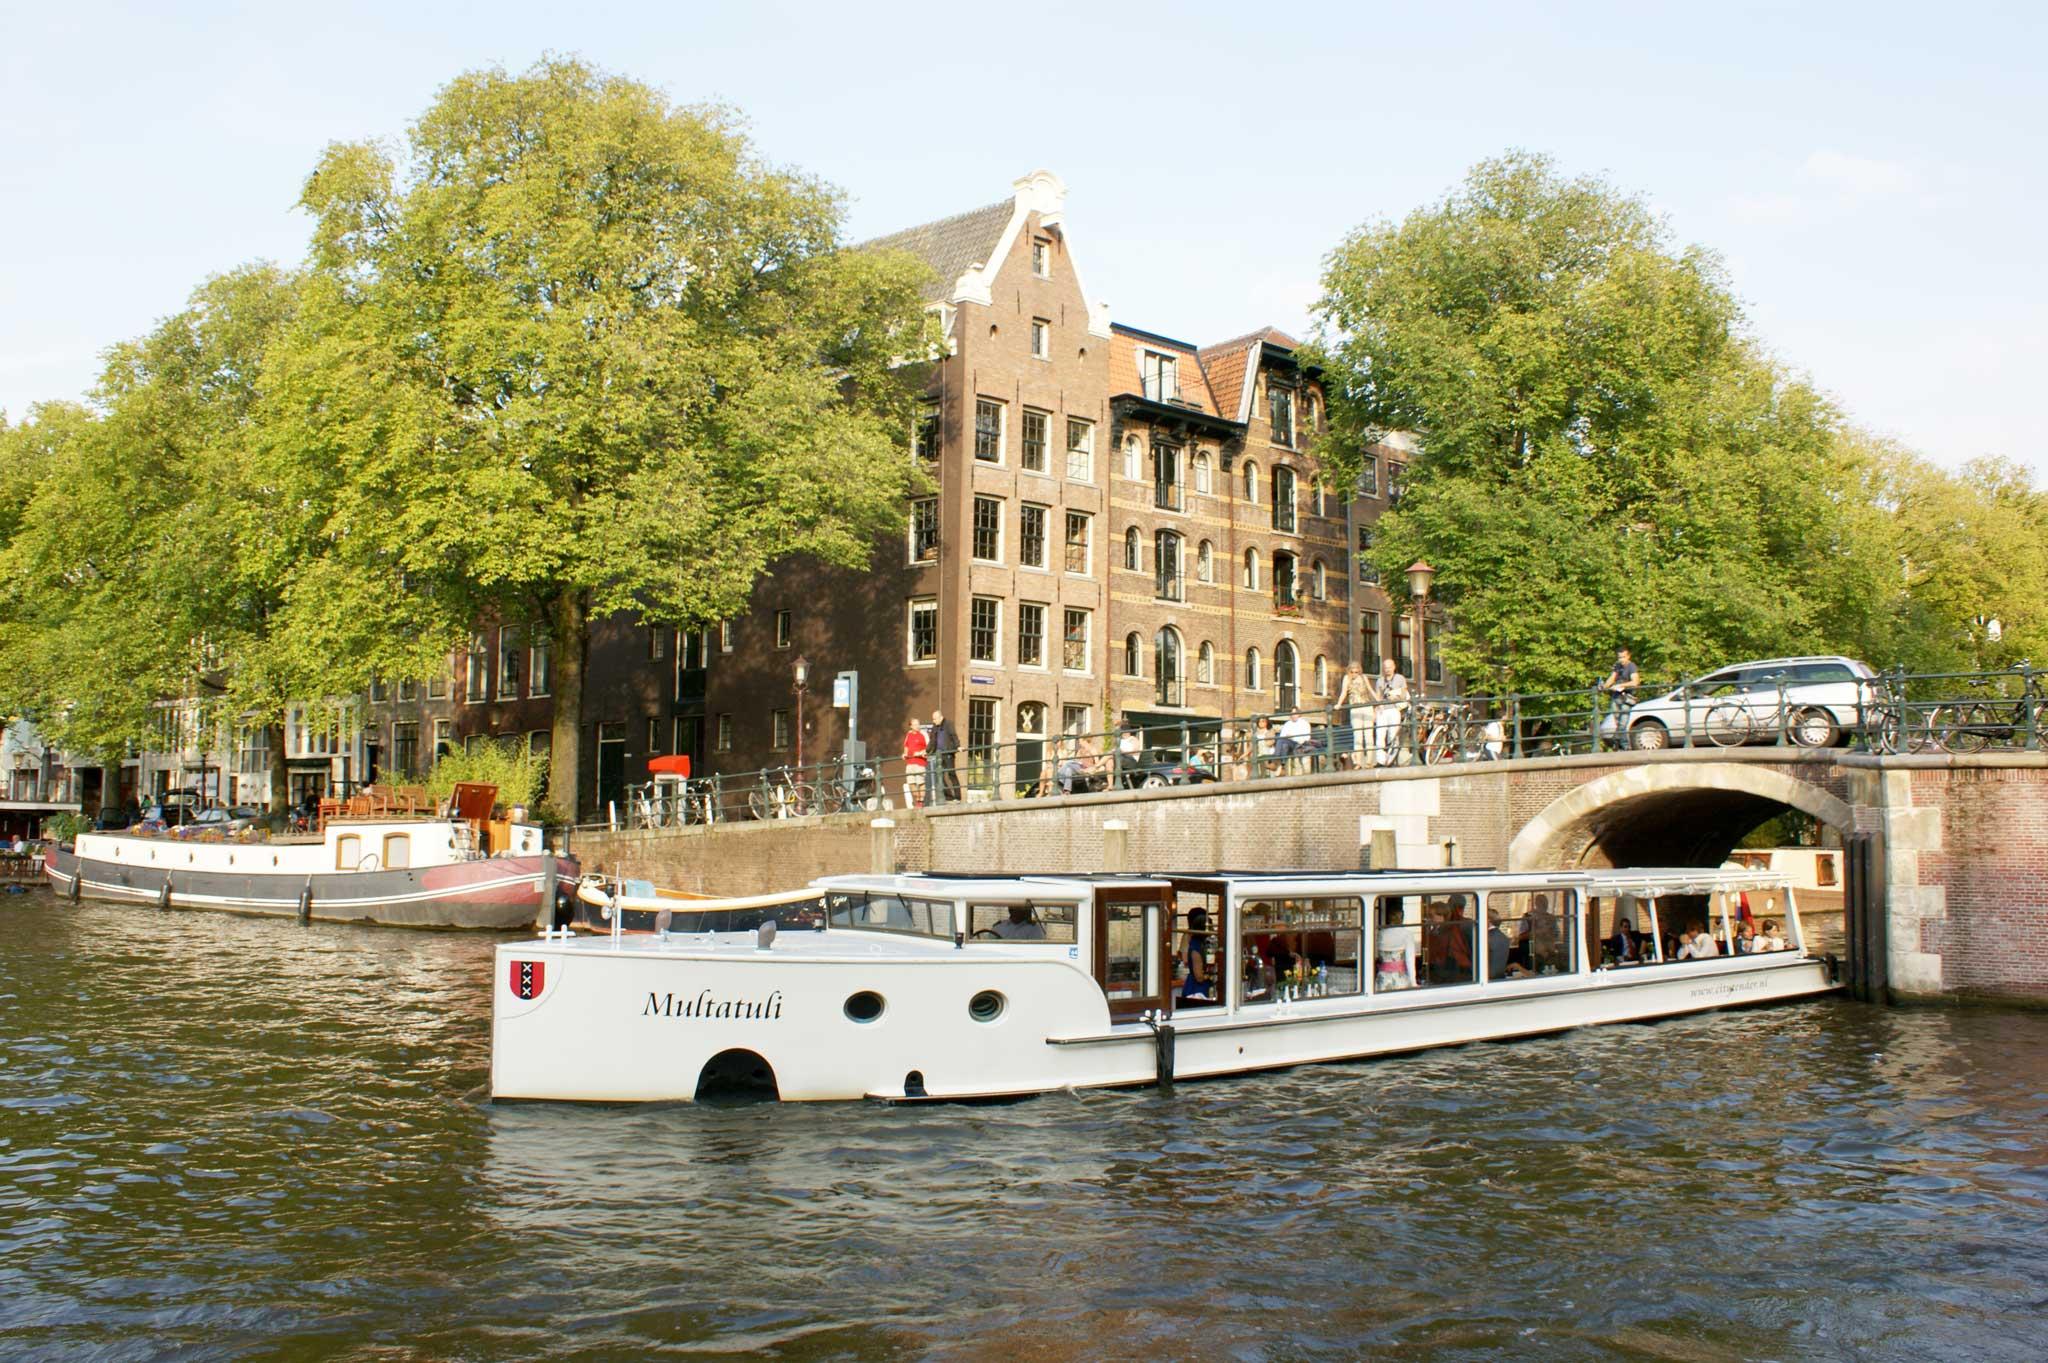 Multatuli op de Amsterdamse gracht